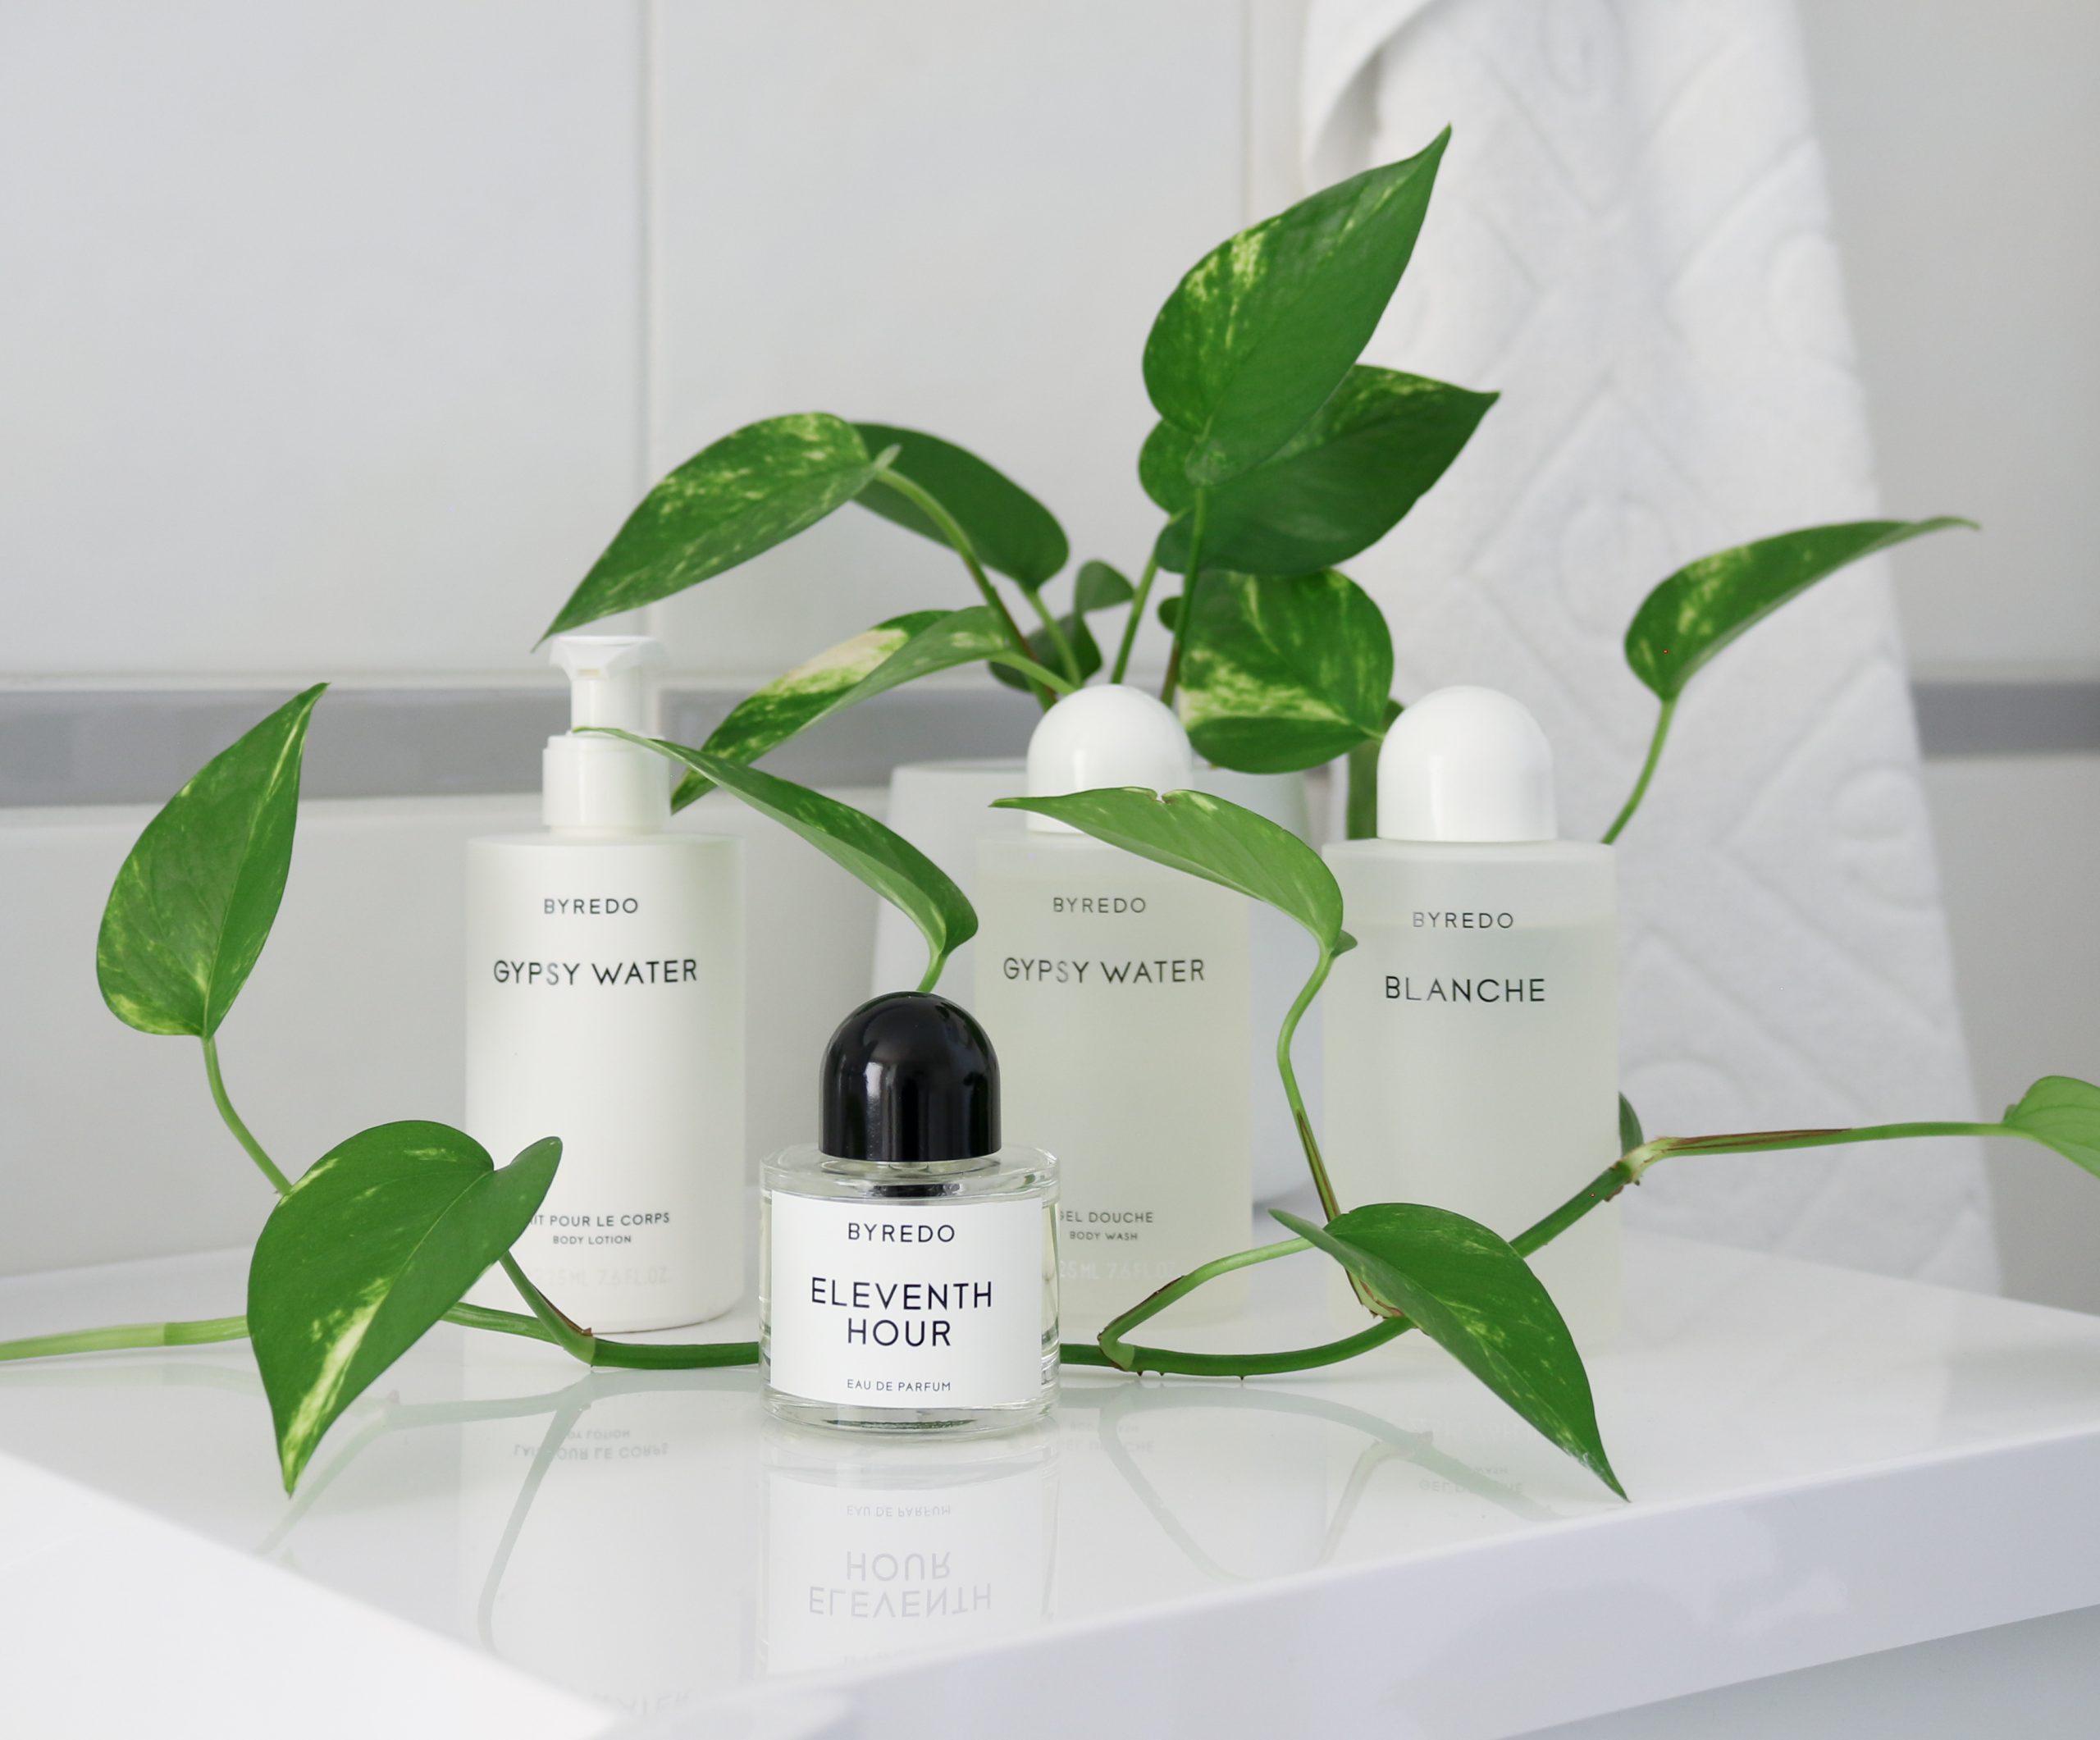 Byredo tuoksut kokemuksia Blanche Gypsy Water ja Eleventh Hour Omakotivalkoinen